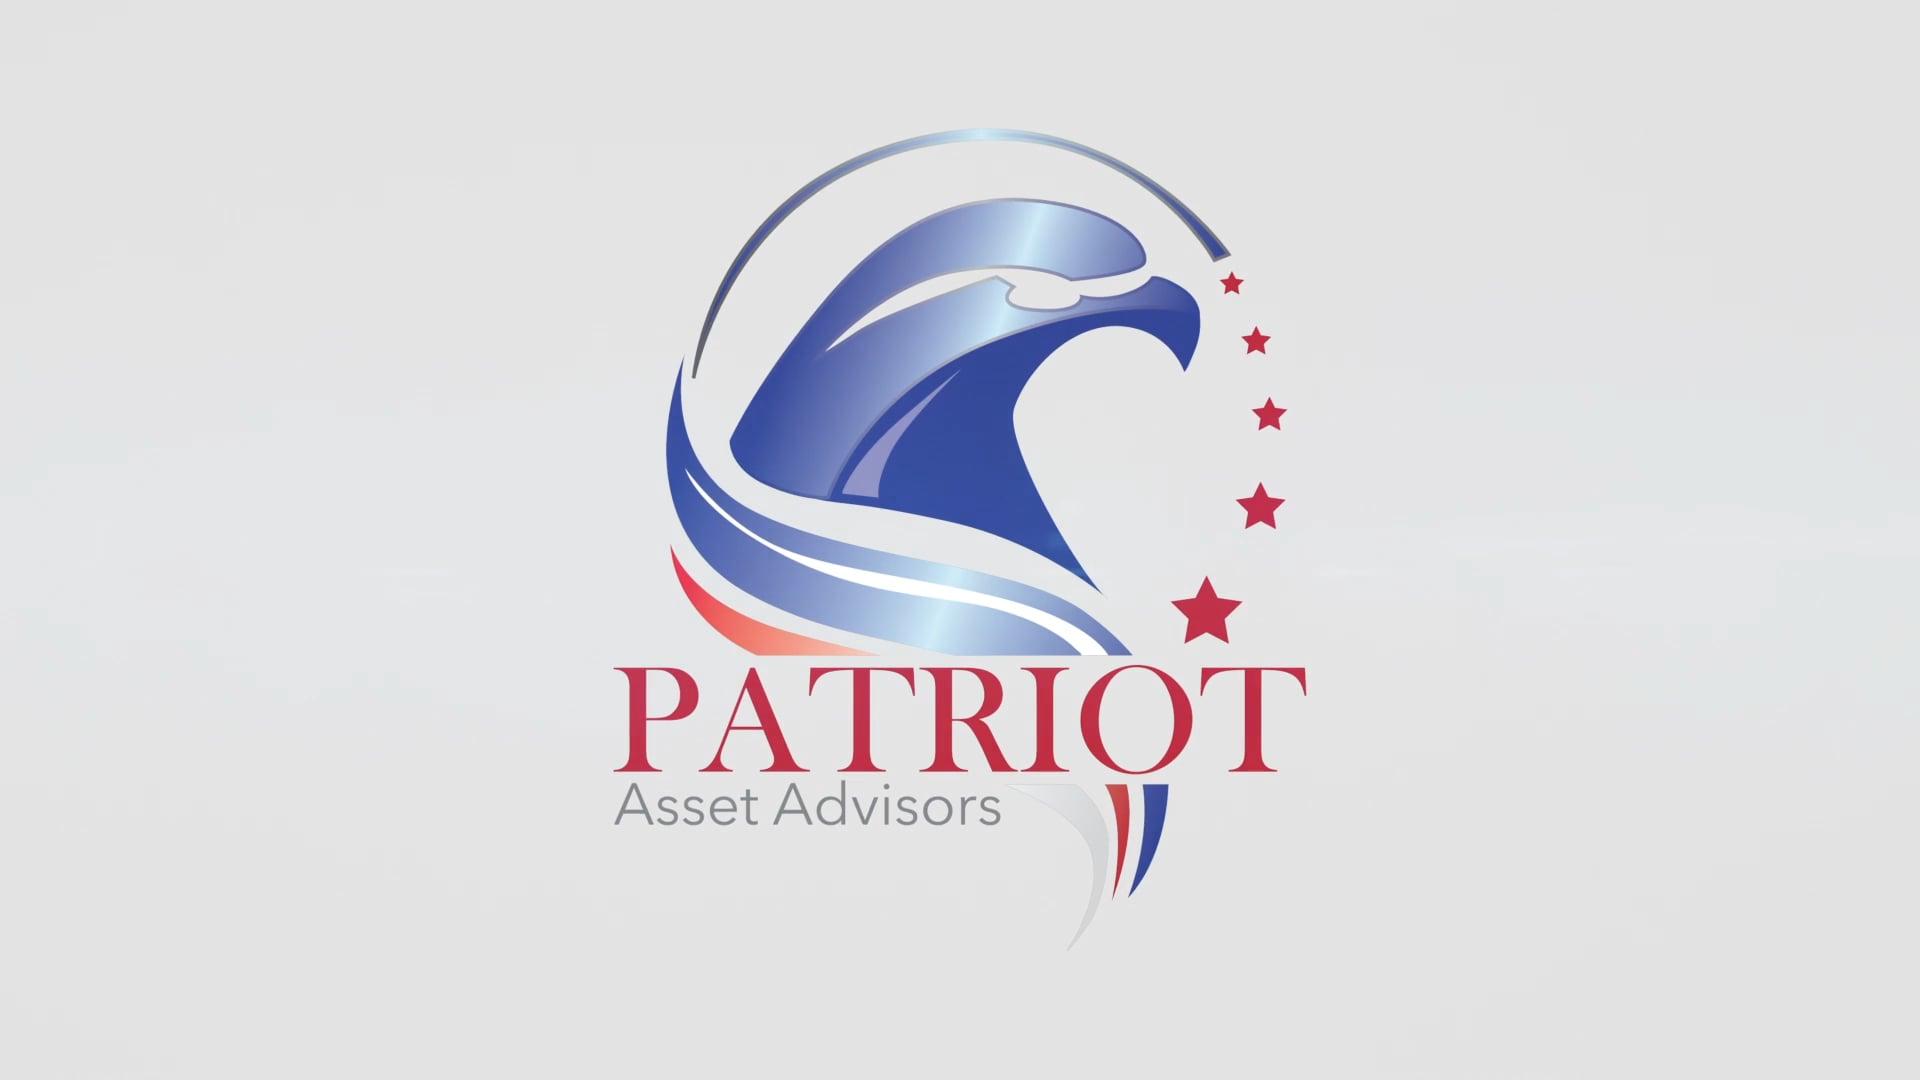 Patriot Asset Advisors | Dream. Plan. Achieve.